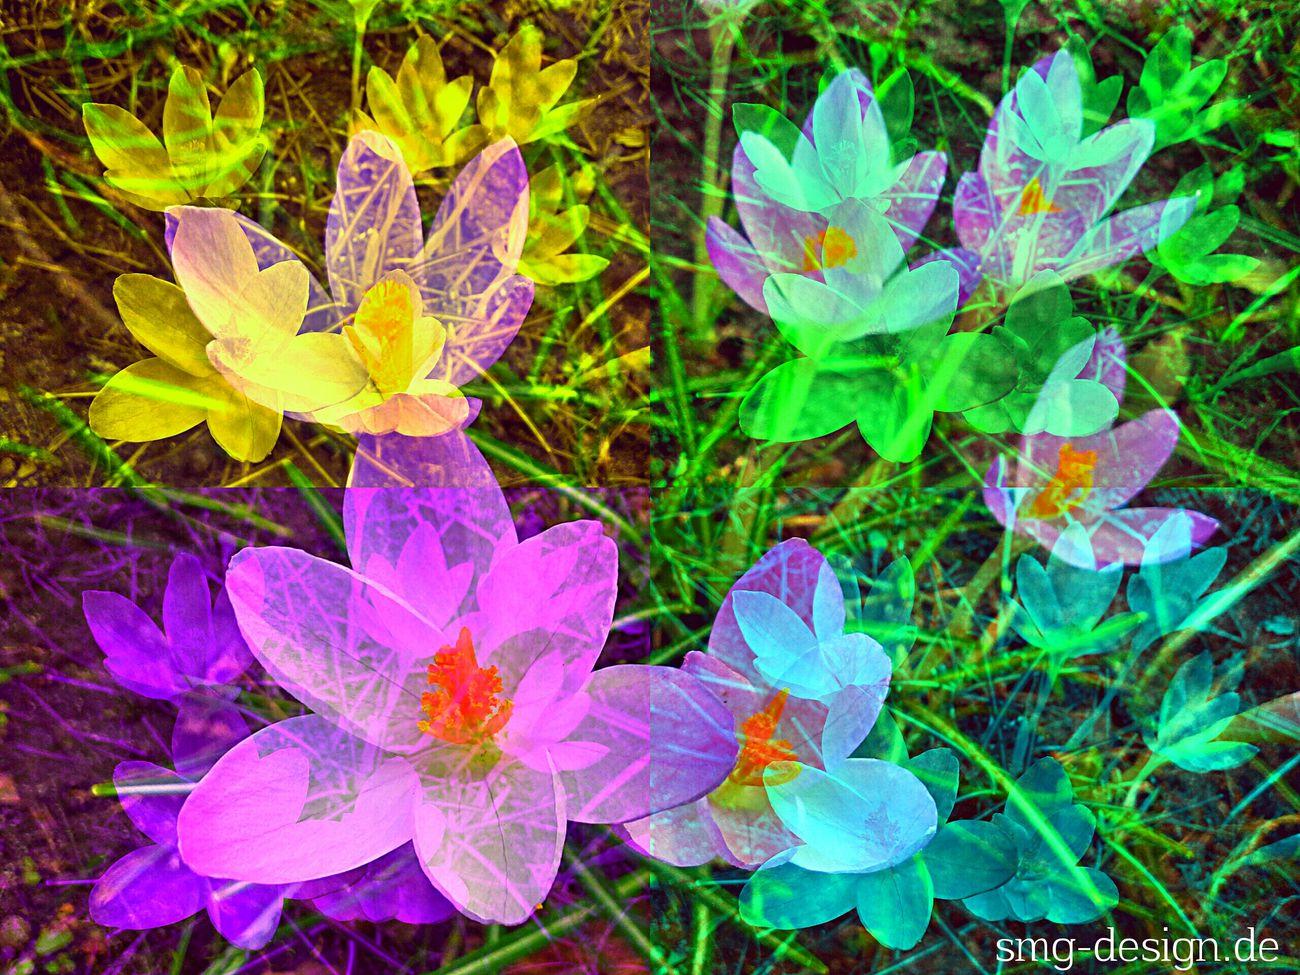 Creative Power Popular Photos EyeEm Nature Lover EyeEm Best Edits we love Flowers, Nature and beautiful Design www.smg-design.de